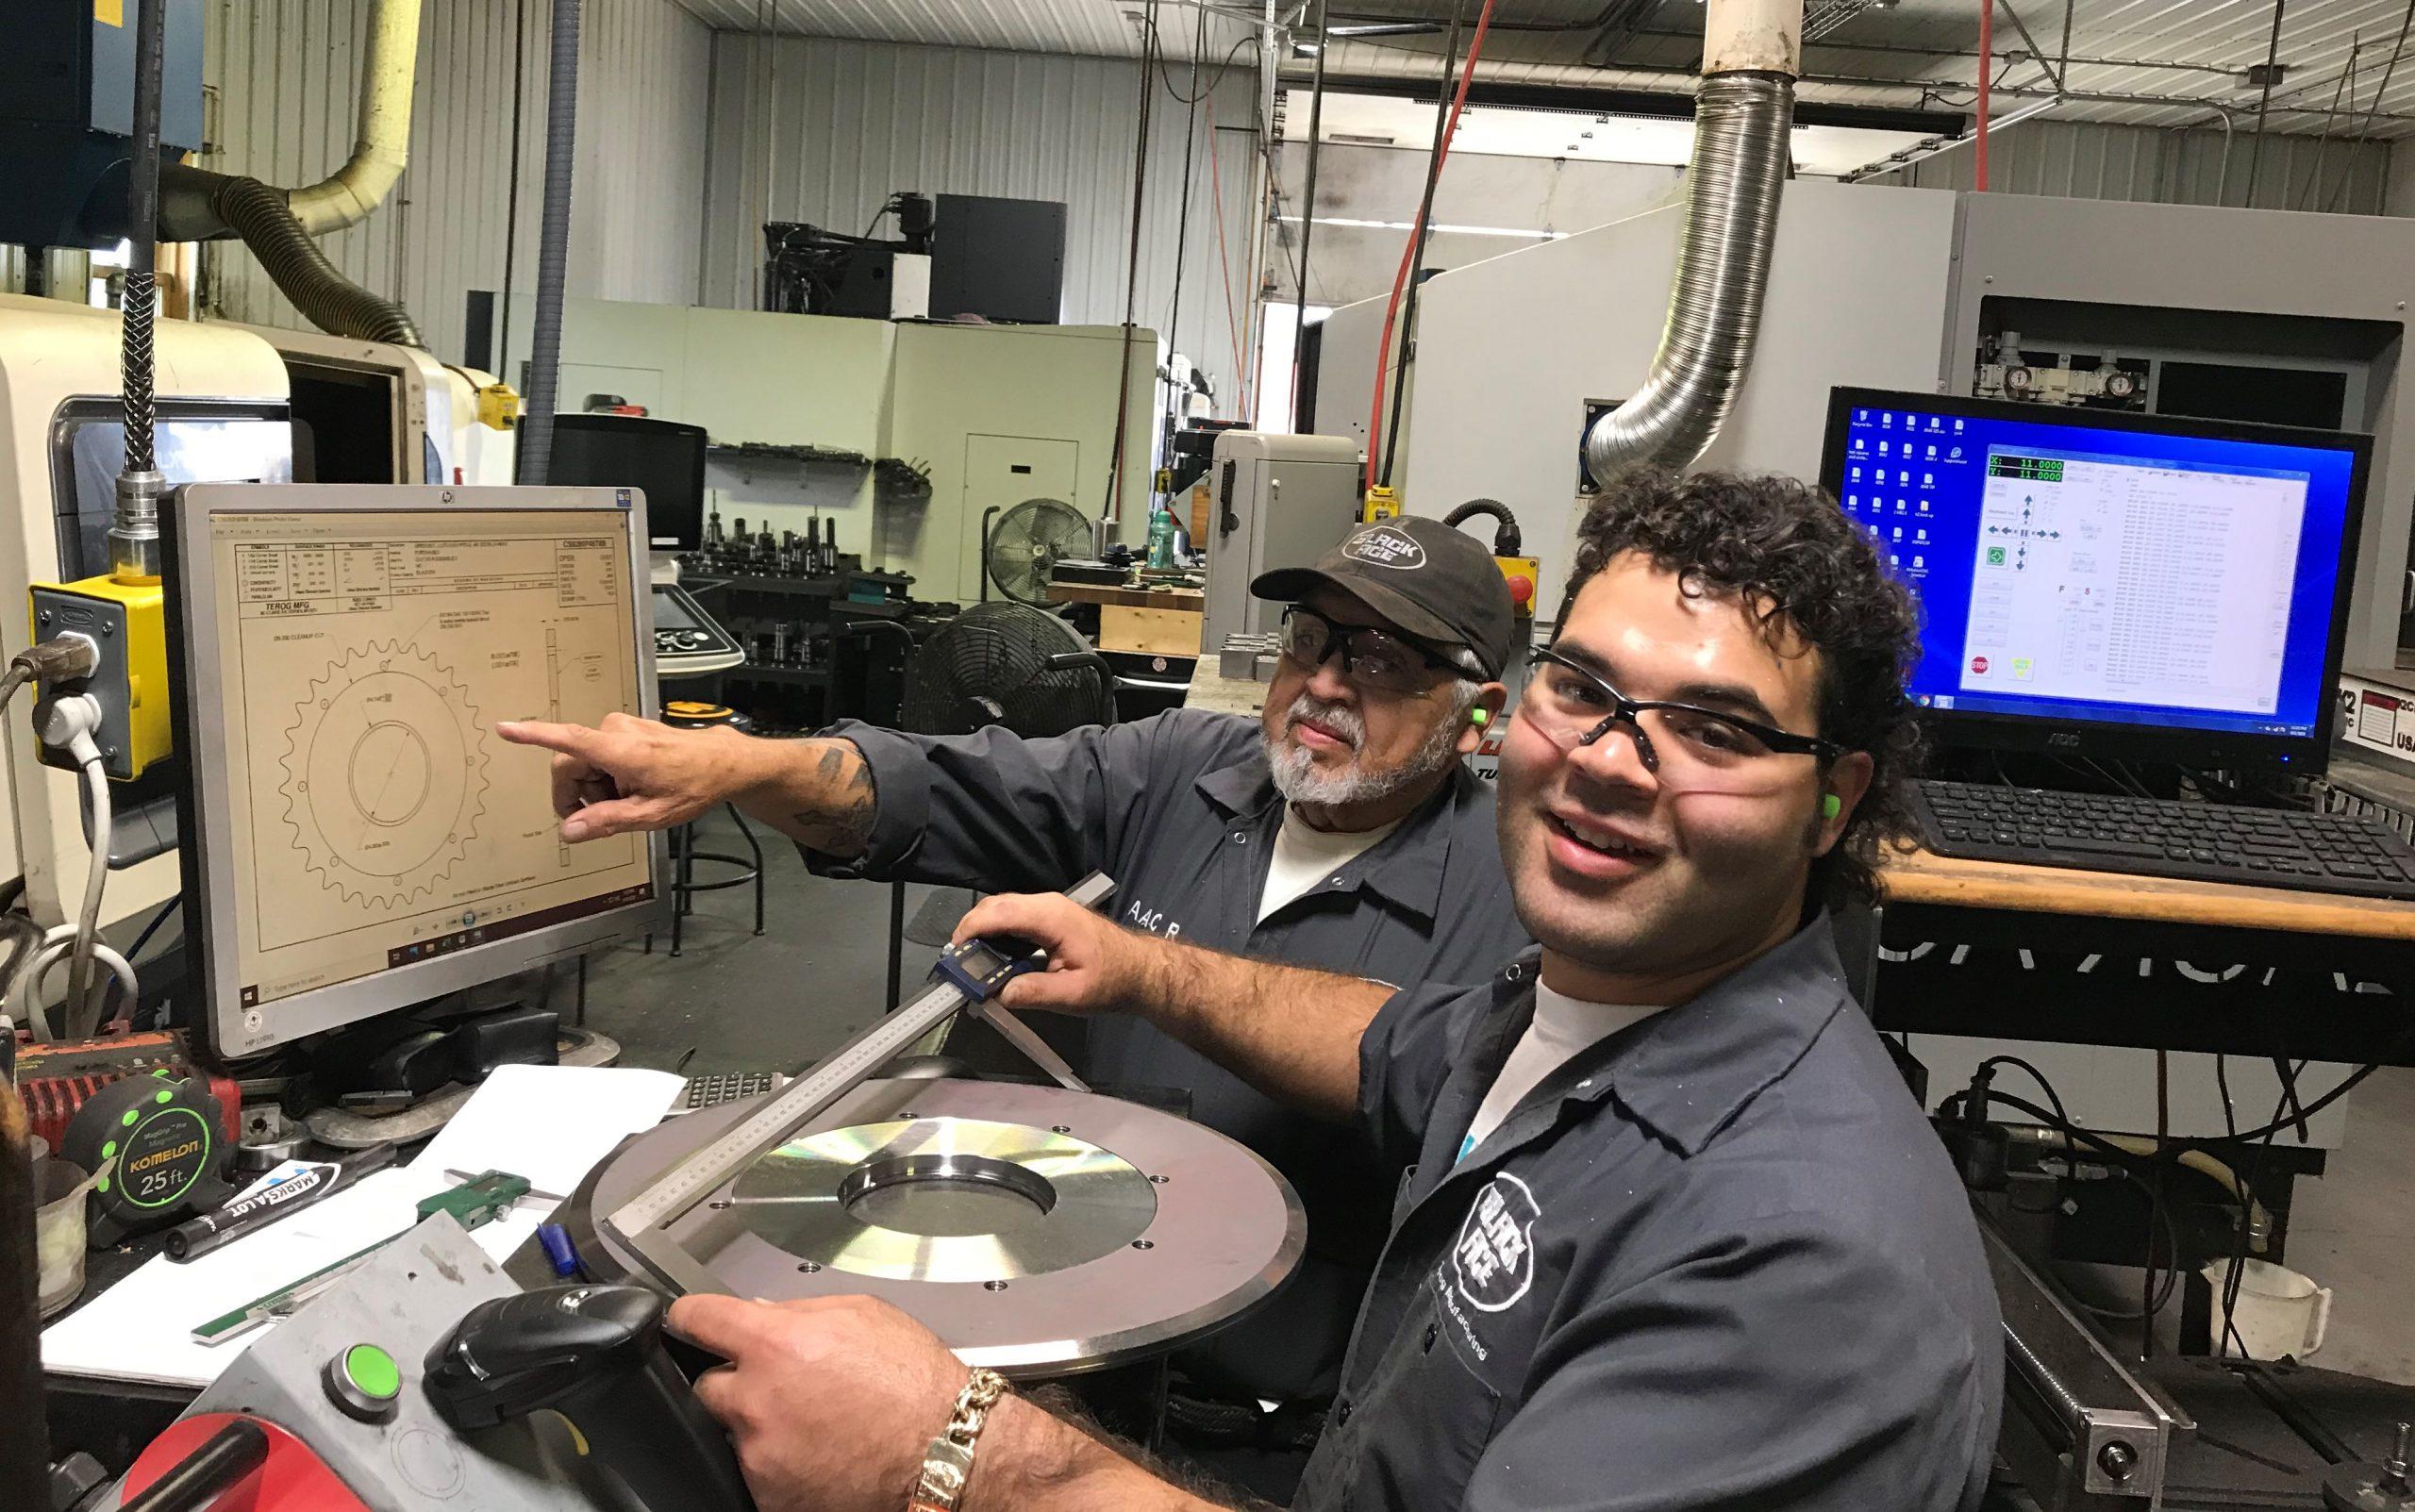 STEM, STEM internship, paid internship, Minnesota, MN, Greater Minnesota, engineering, machining